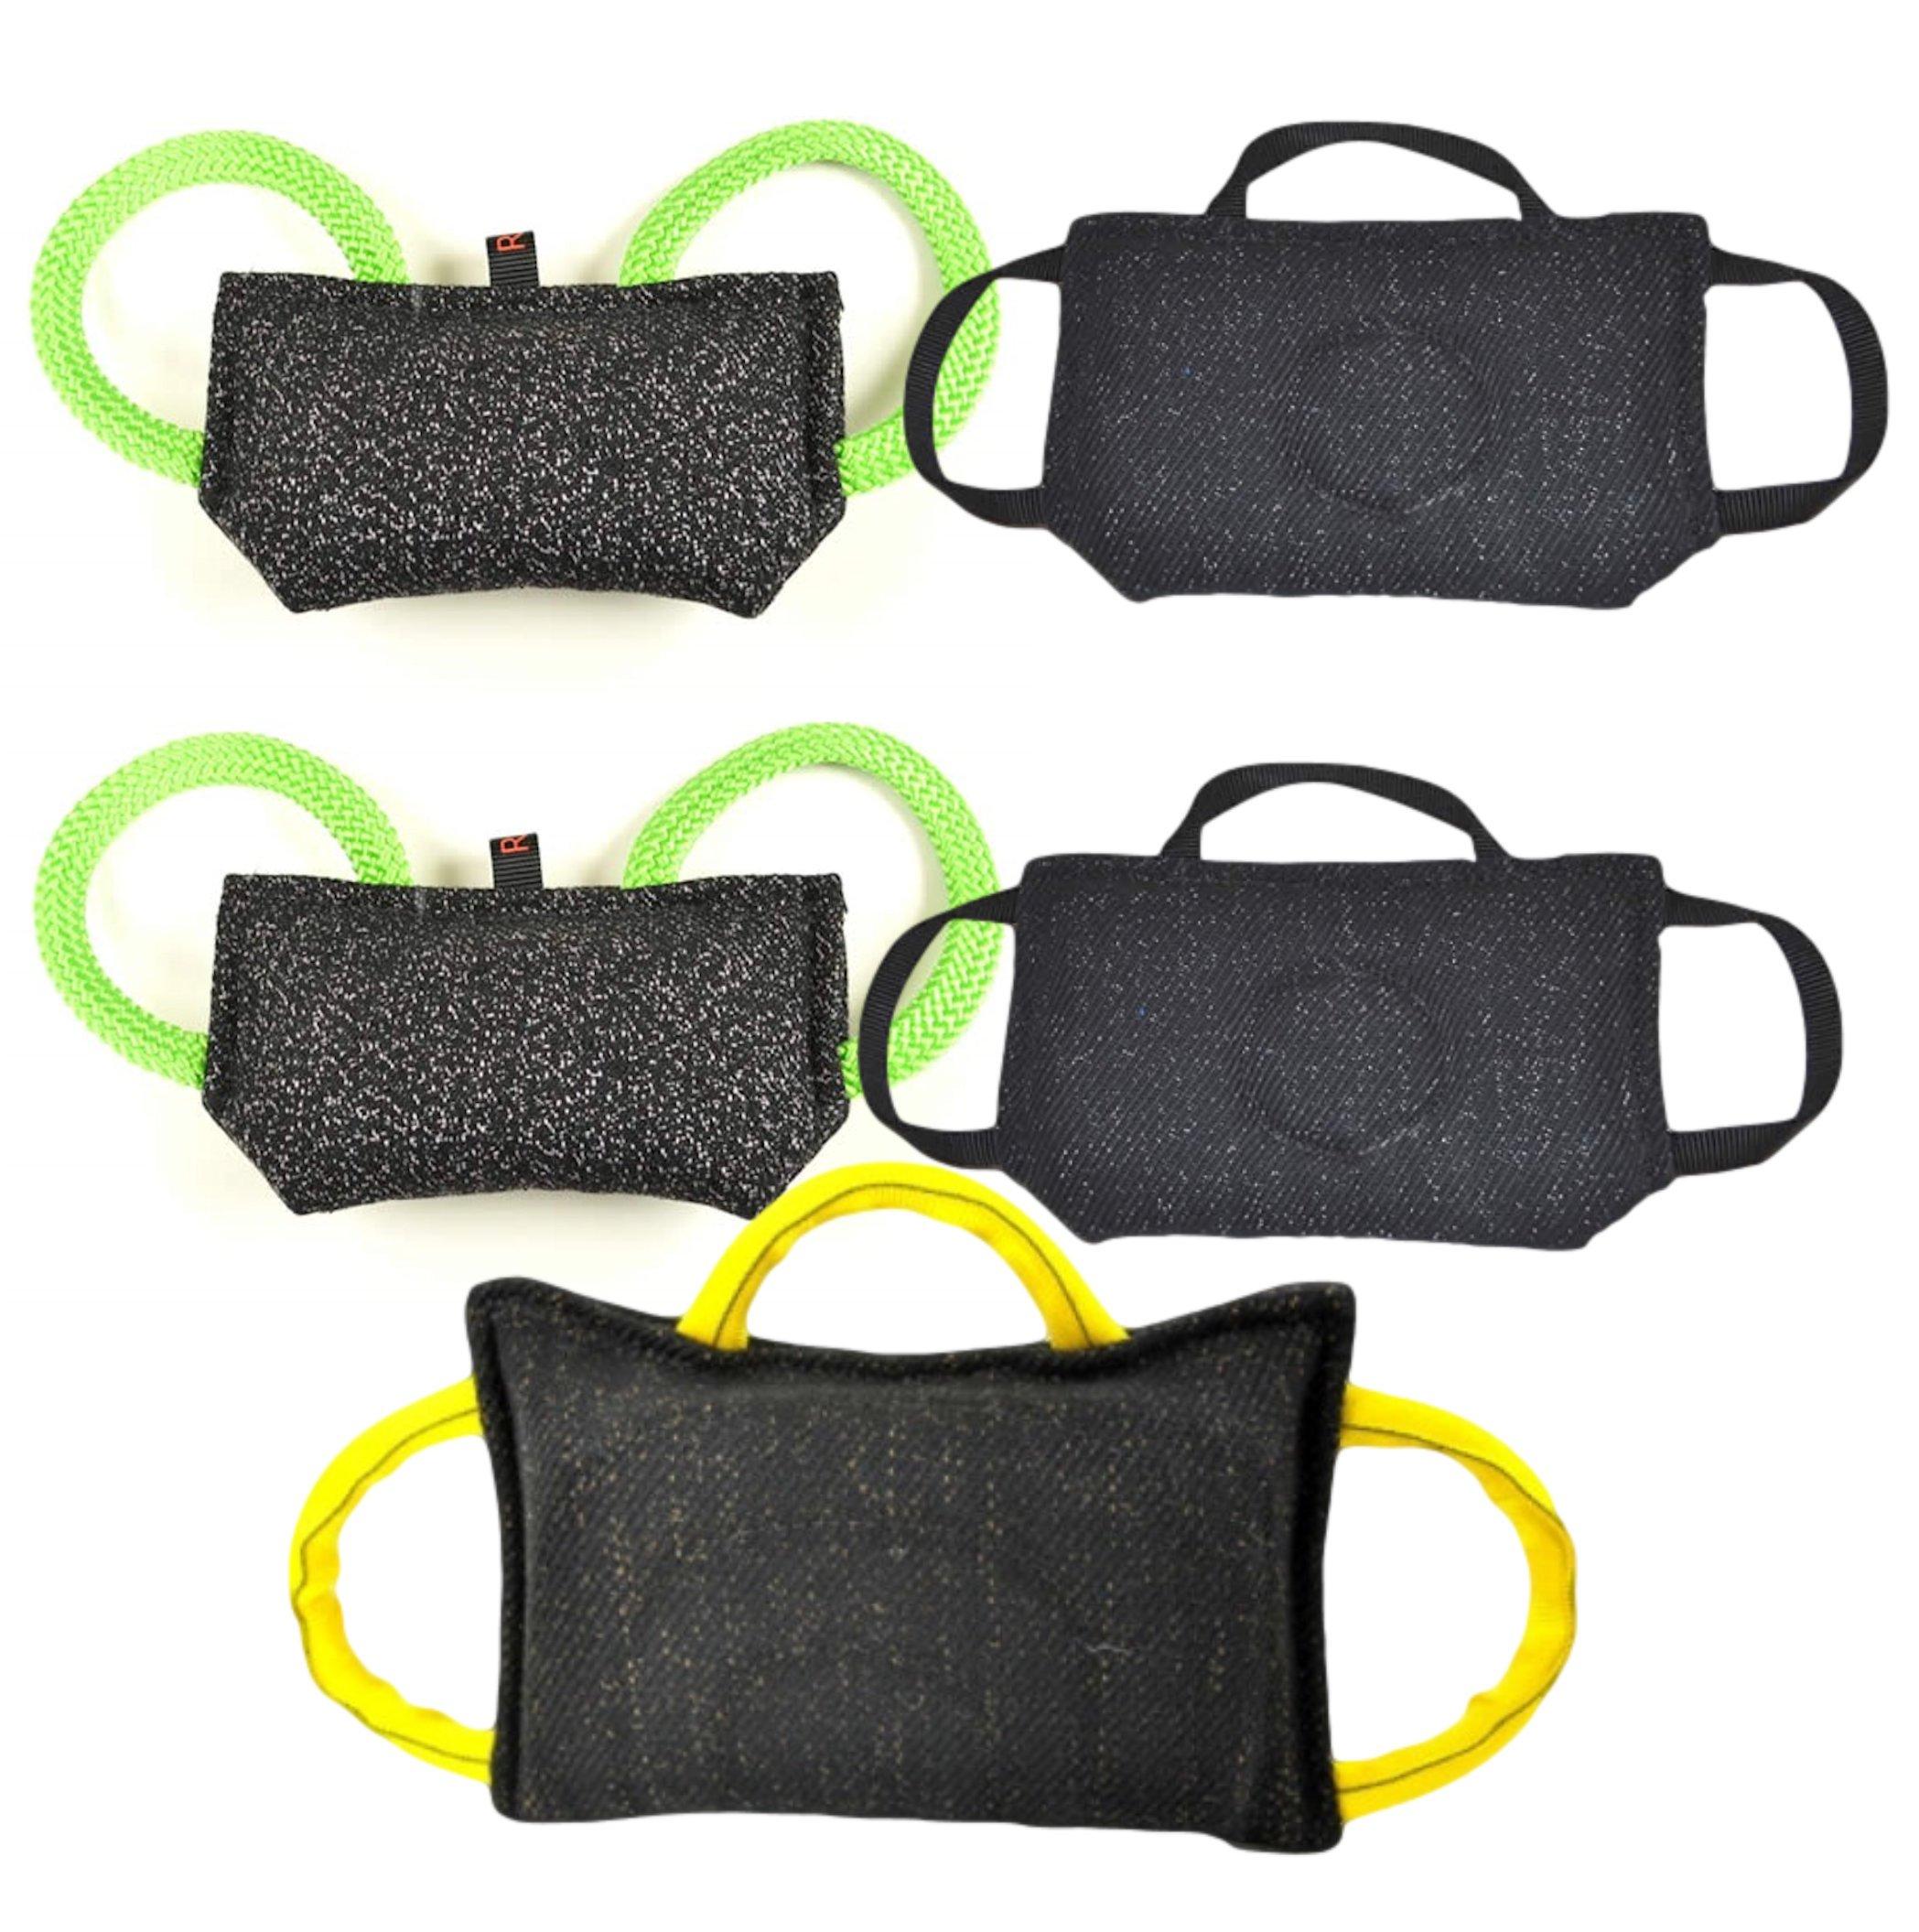 Puppy Tug Toy Bundle - 1 - 3 Handle Bite Pillow (15.5'' X 9.75''), 2 - 3 Handle Flat Tug Toys (11'' X 7''), 2 - Handle Puppy Bite Pillow (9.5'' X 4.75'') Redline K9